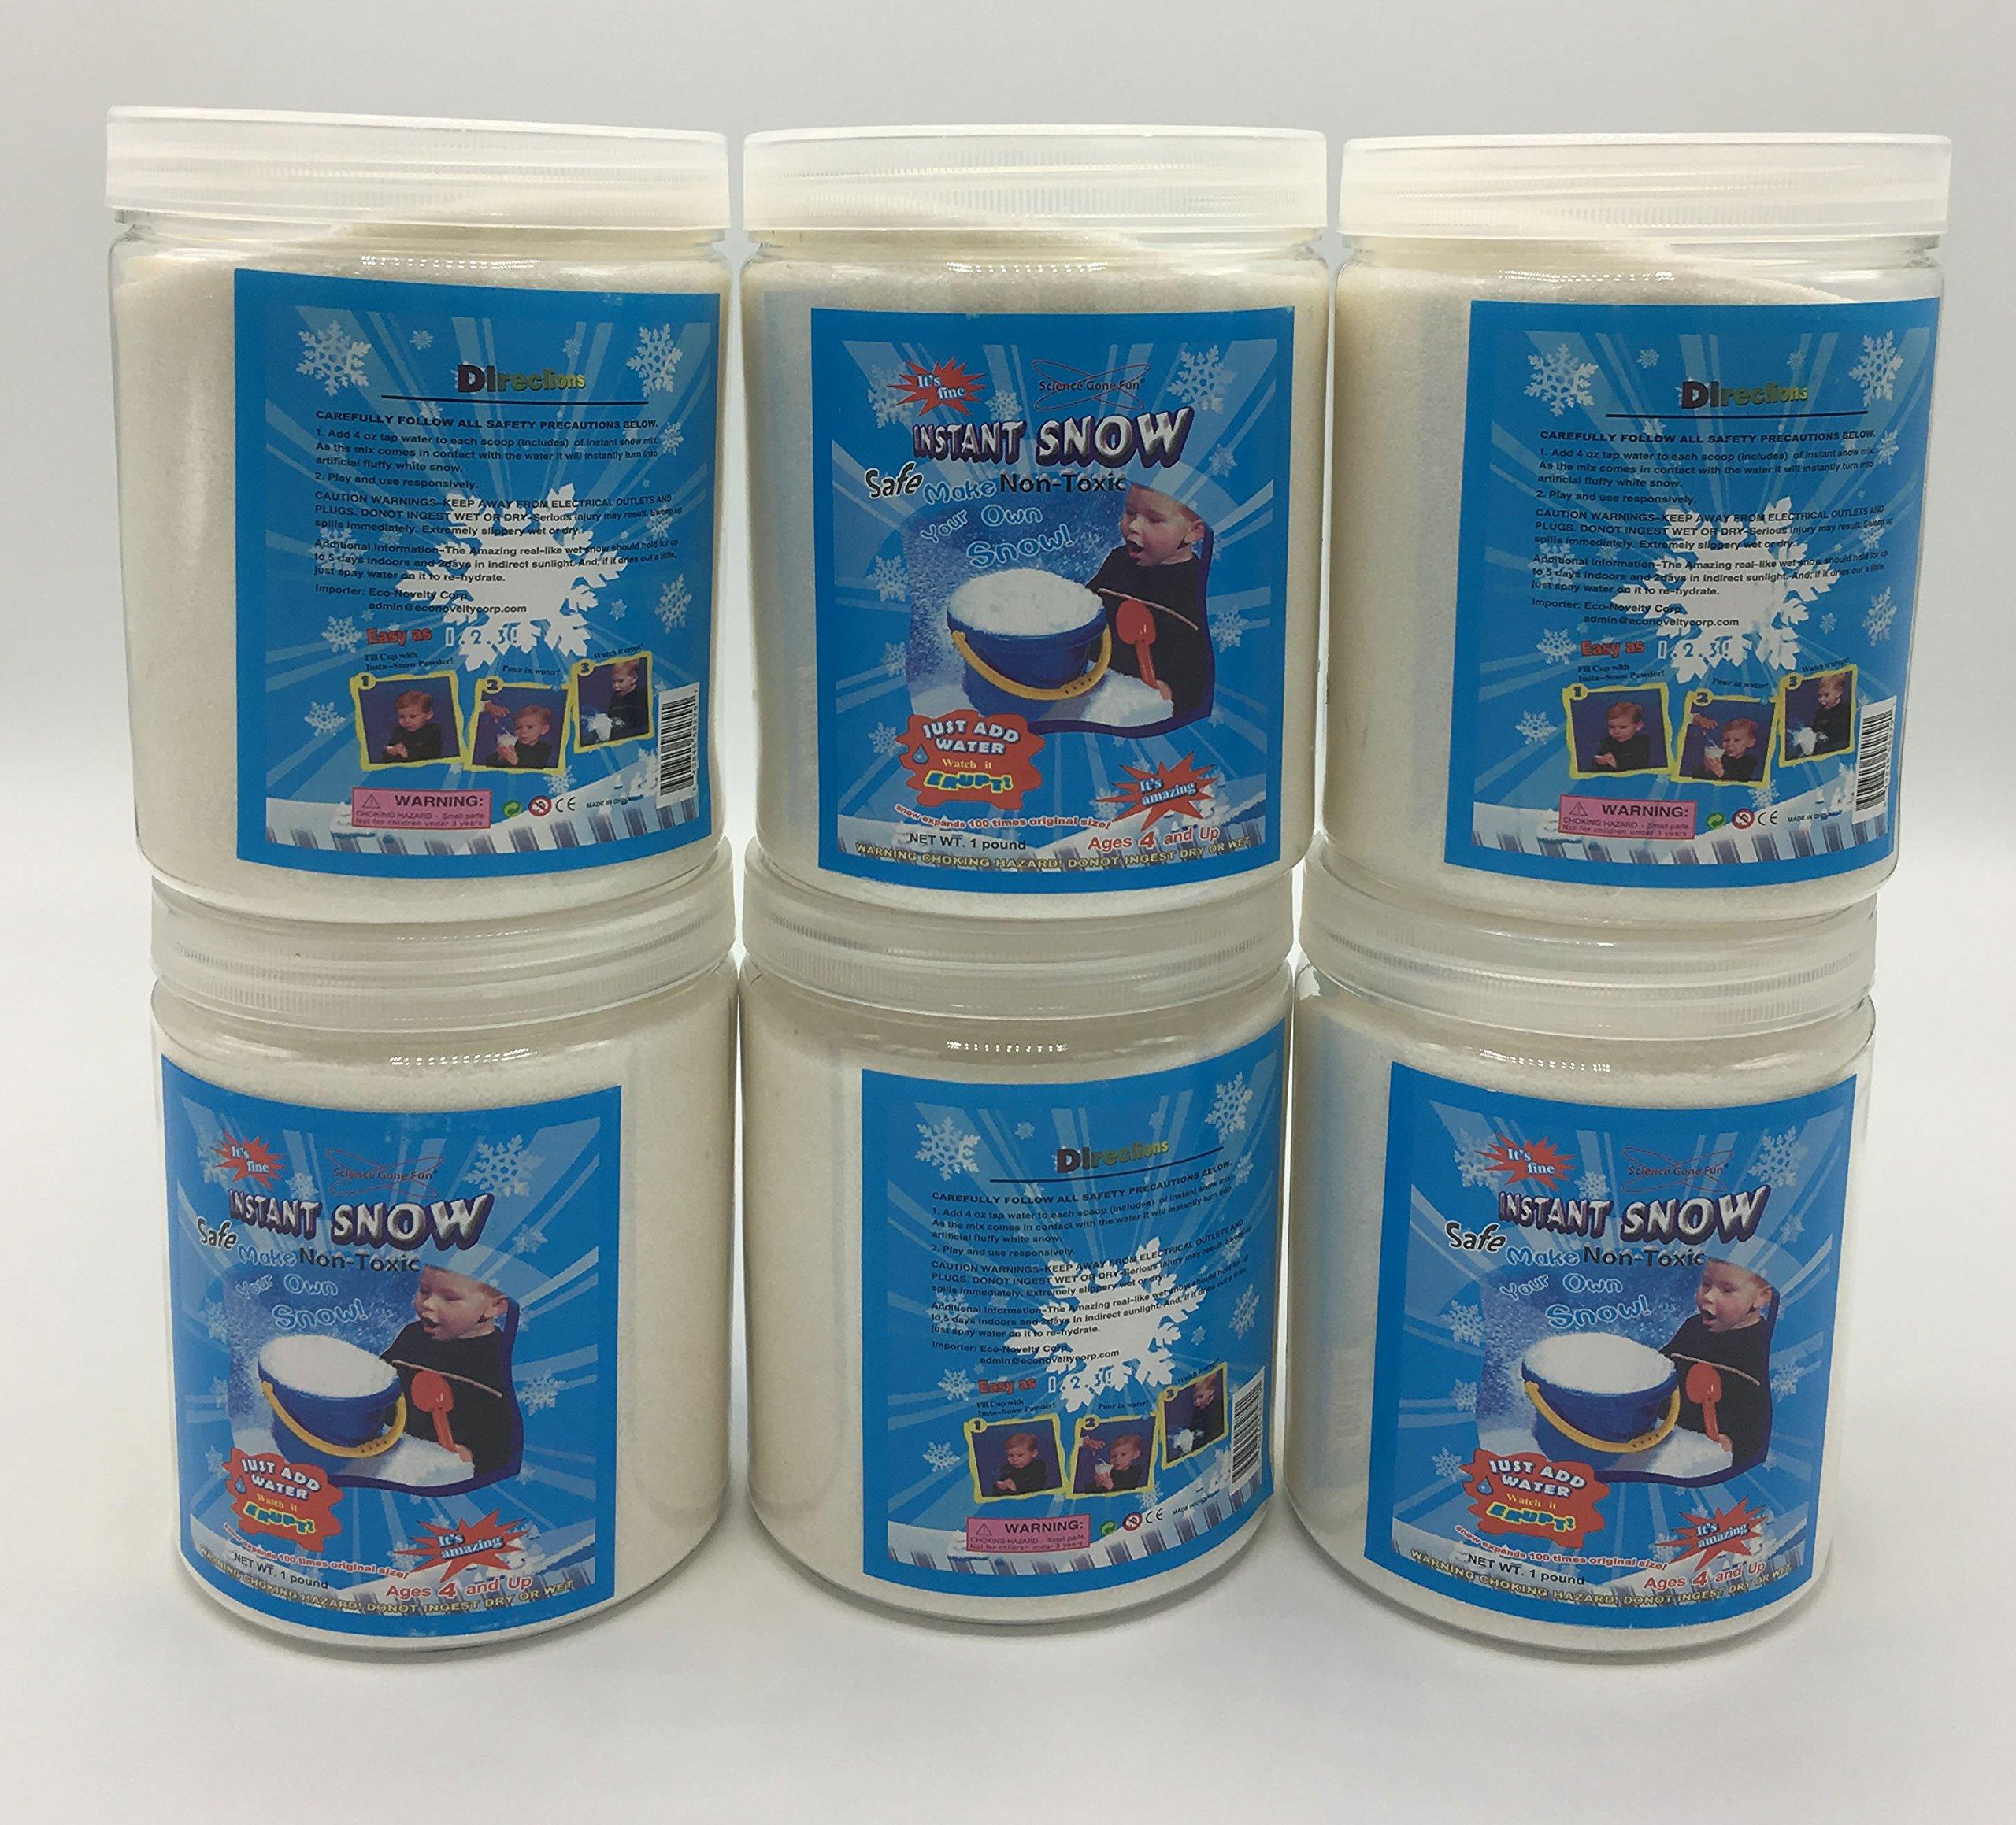 Magic Instant Expanding Snow Powder 1 Pound Jar (6),Makes 48 Gallons